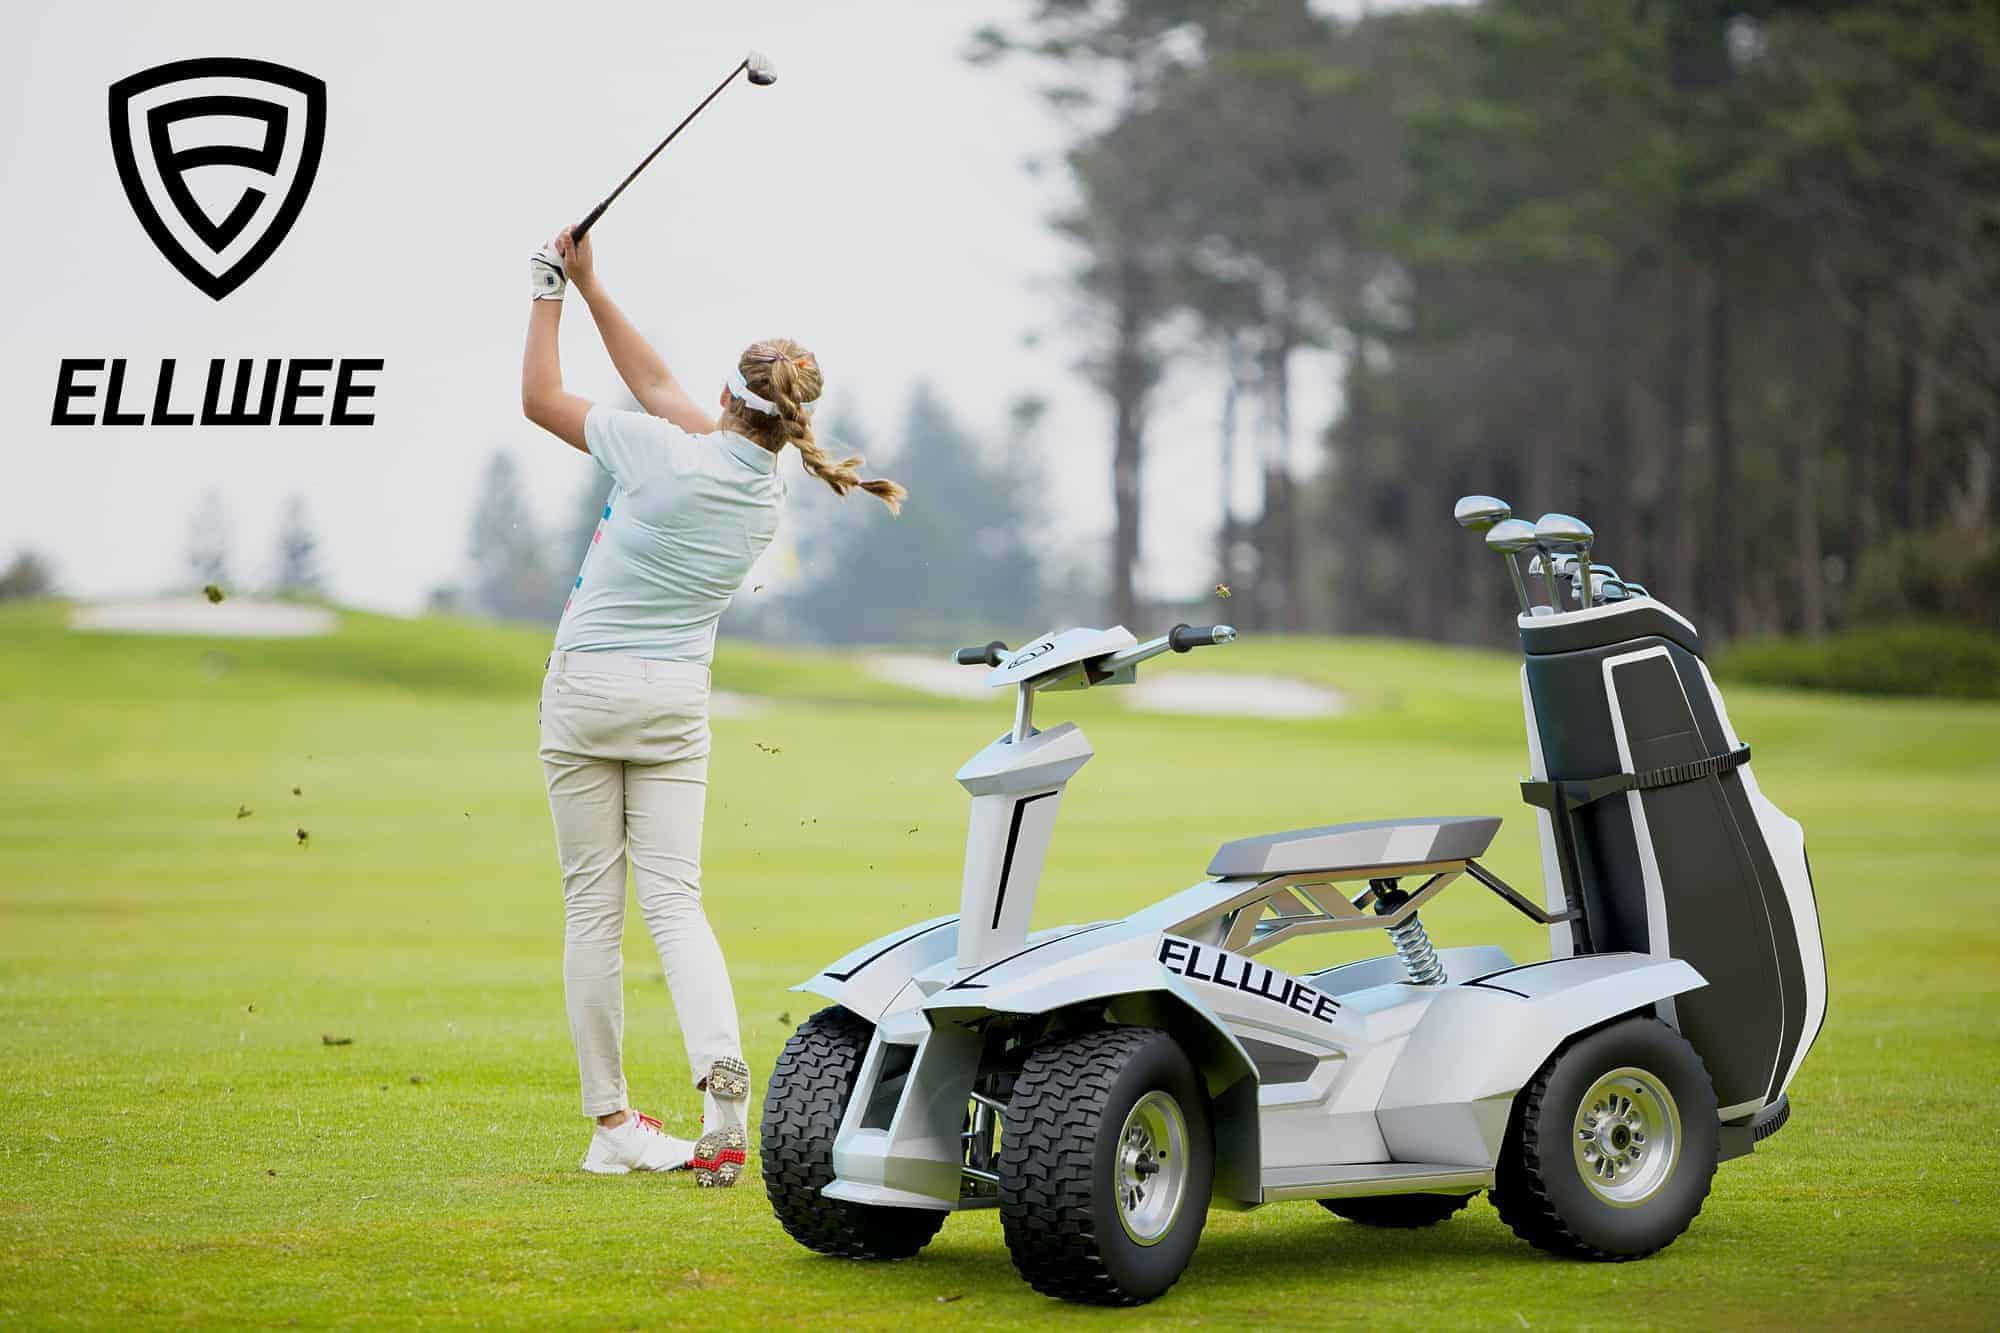 Ellwee Golf Cart Range Servant America